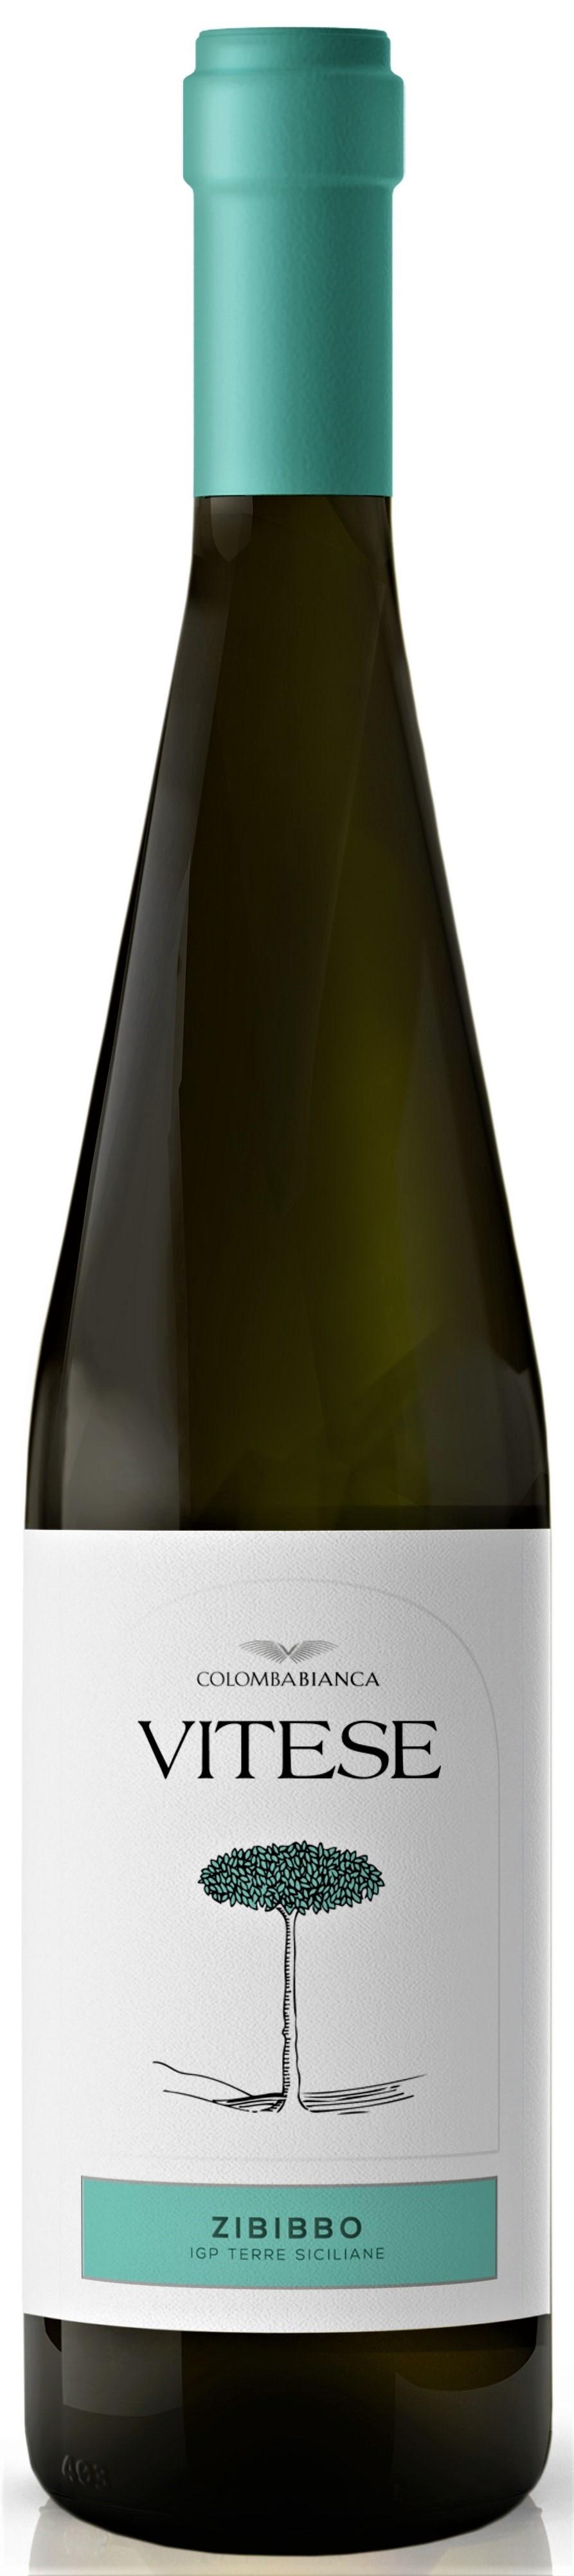 Caudalia wine Box Mayo 2021 Colomba Bianca Vitese Italia 2019 ZIBIBBO